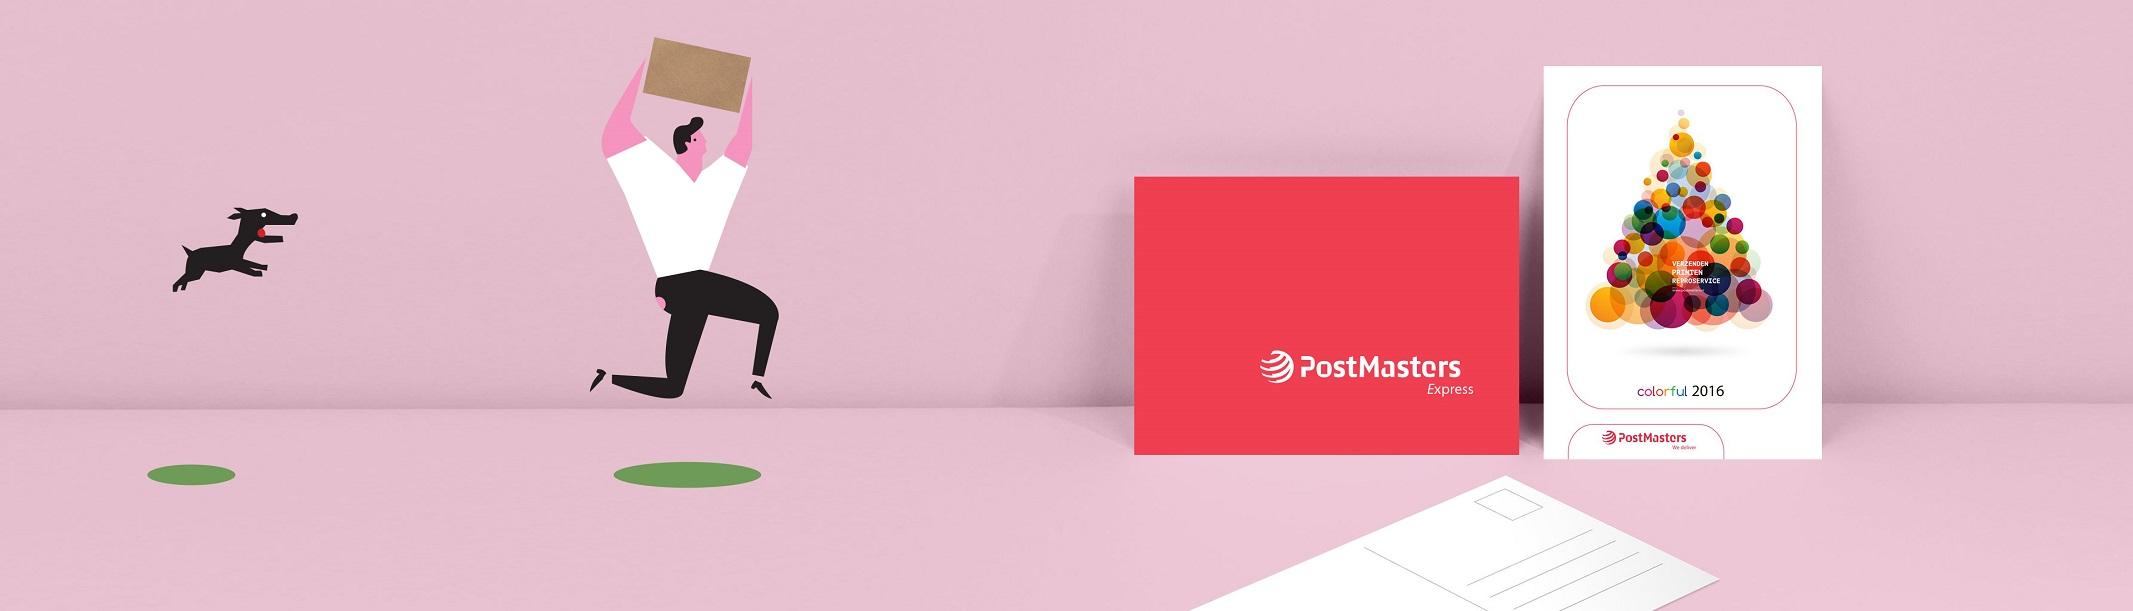 Postmasters mr